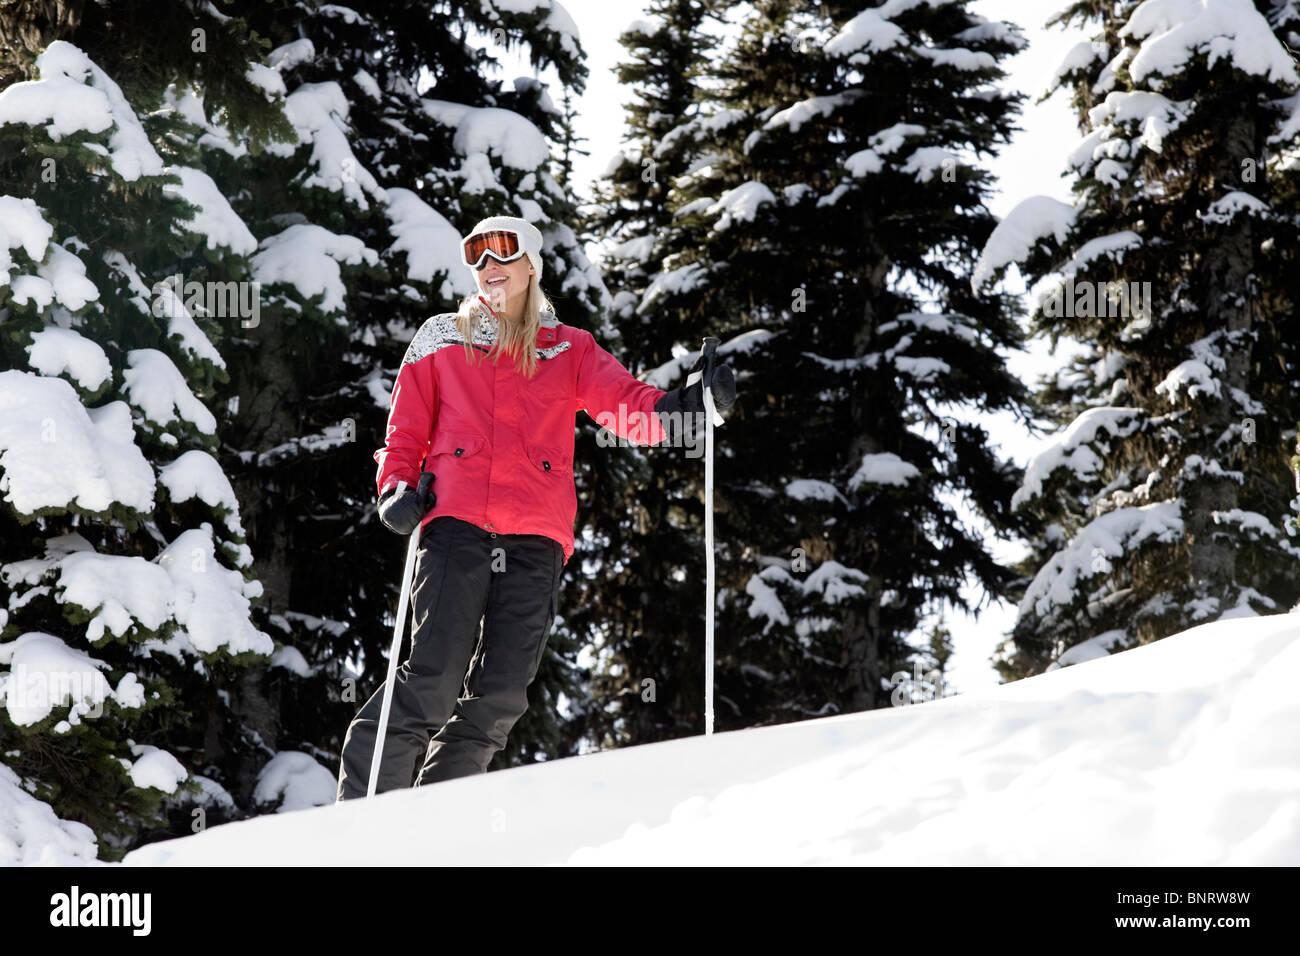 A woman skis among snow flocked trees. - Stock Image